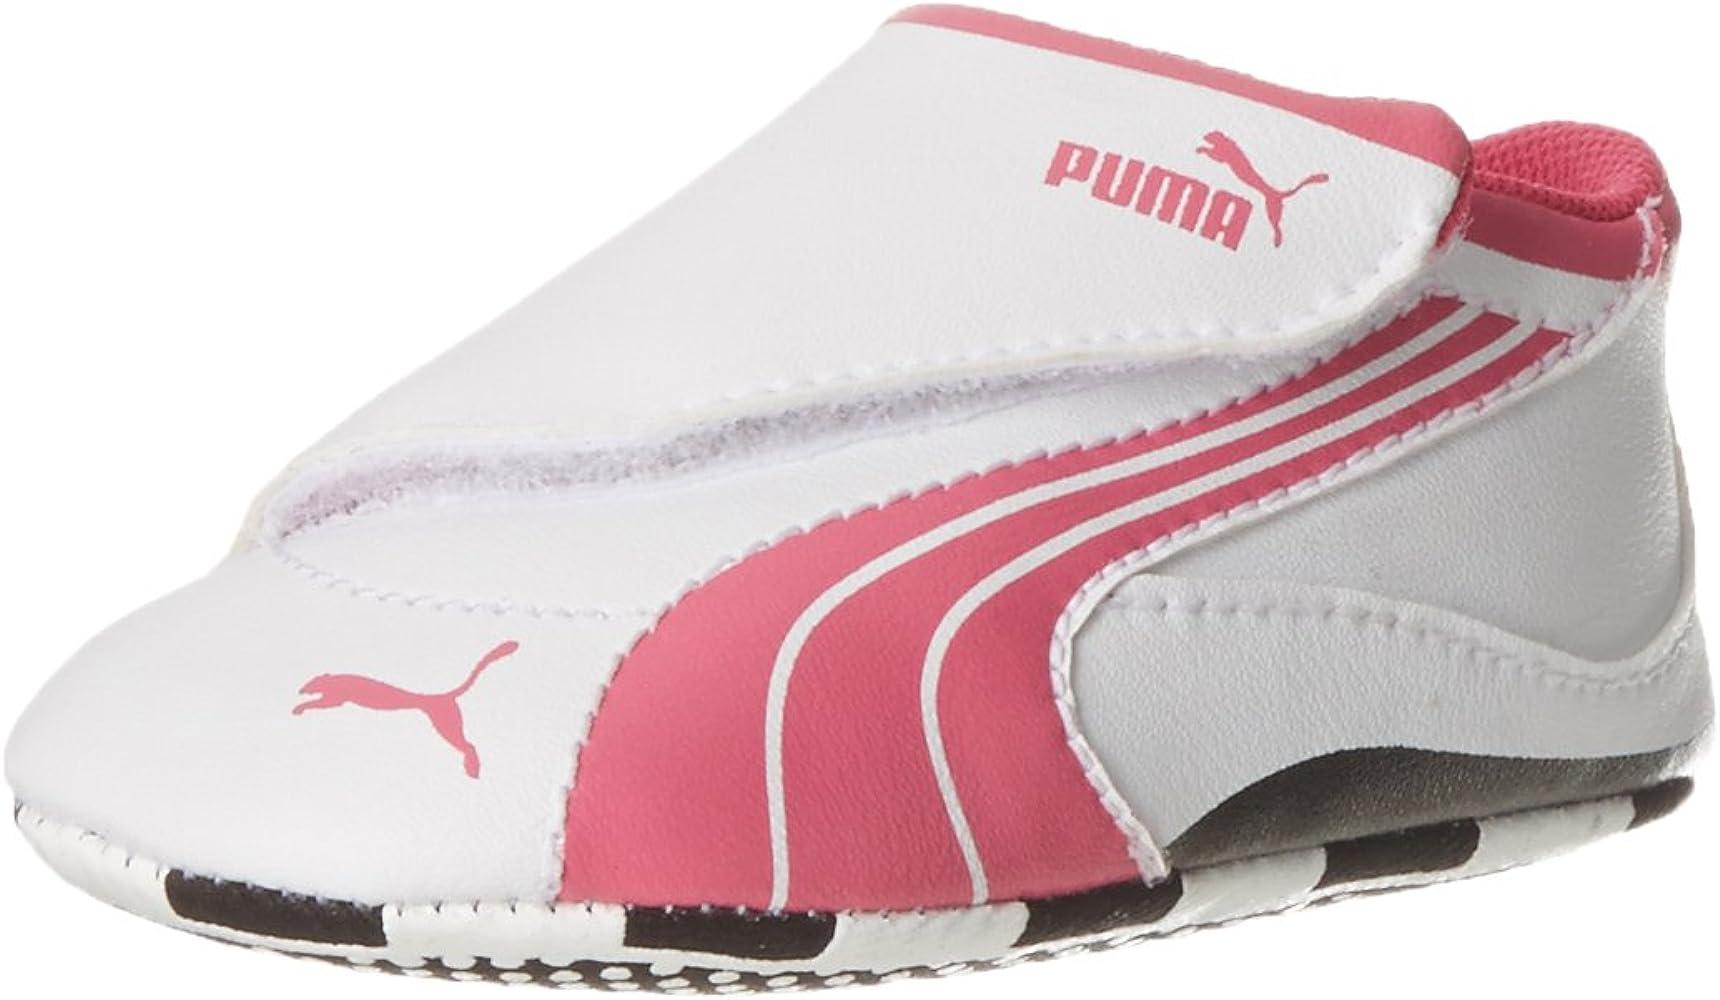 PUMA Drift Cat 4 Low Crib Crib Shoe